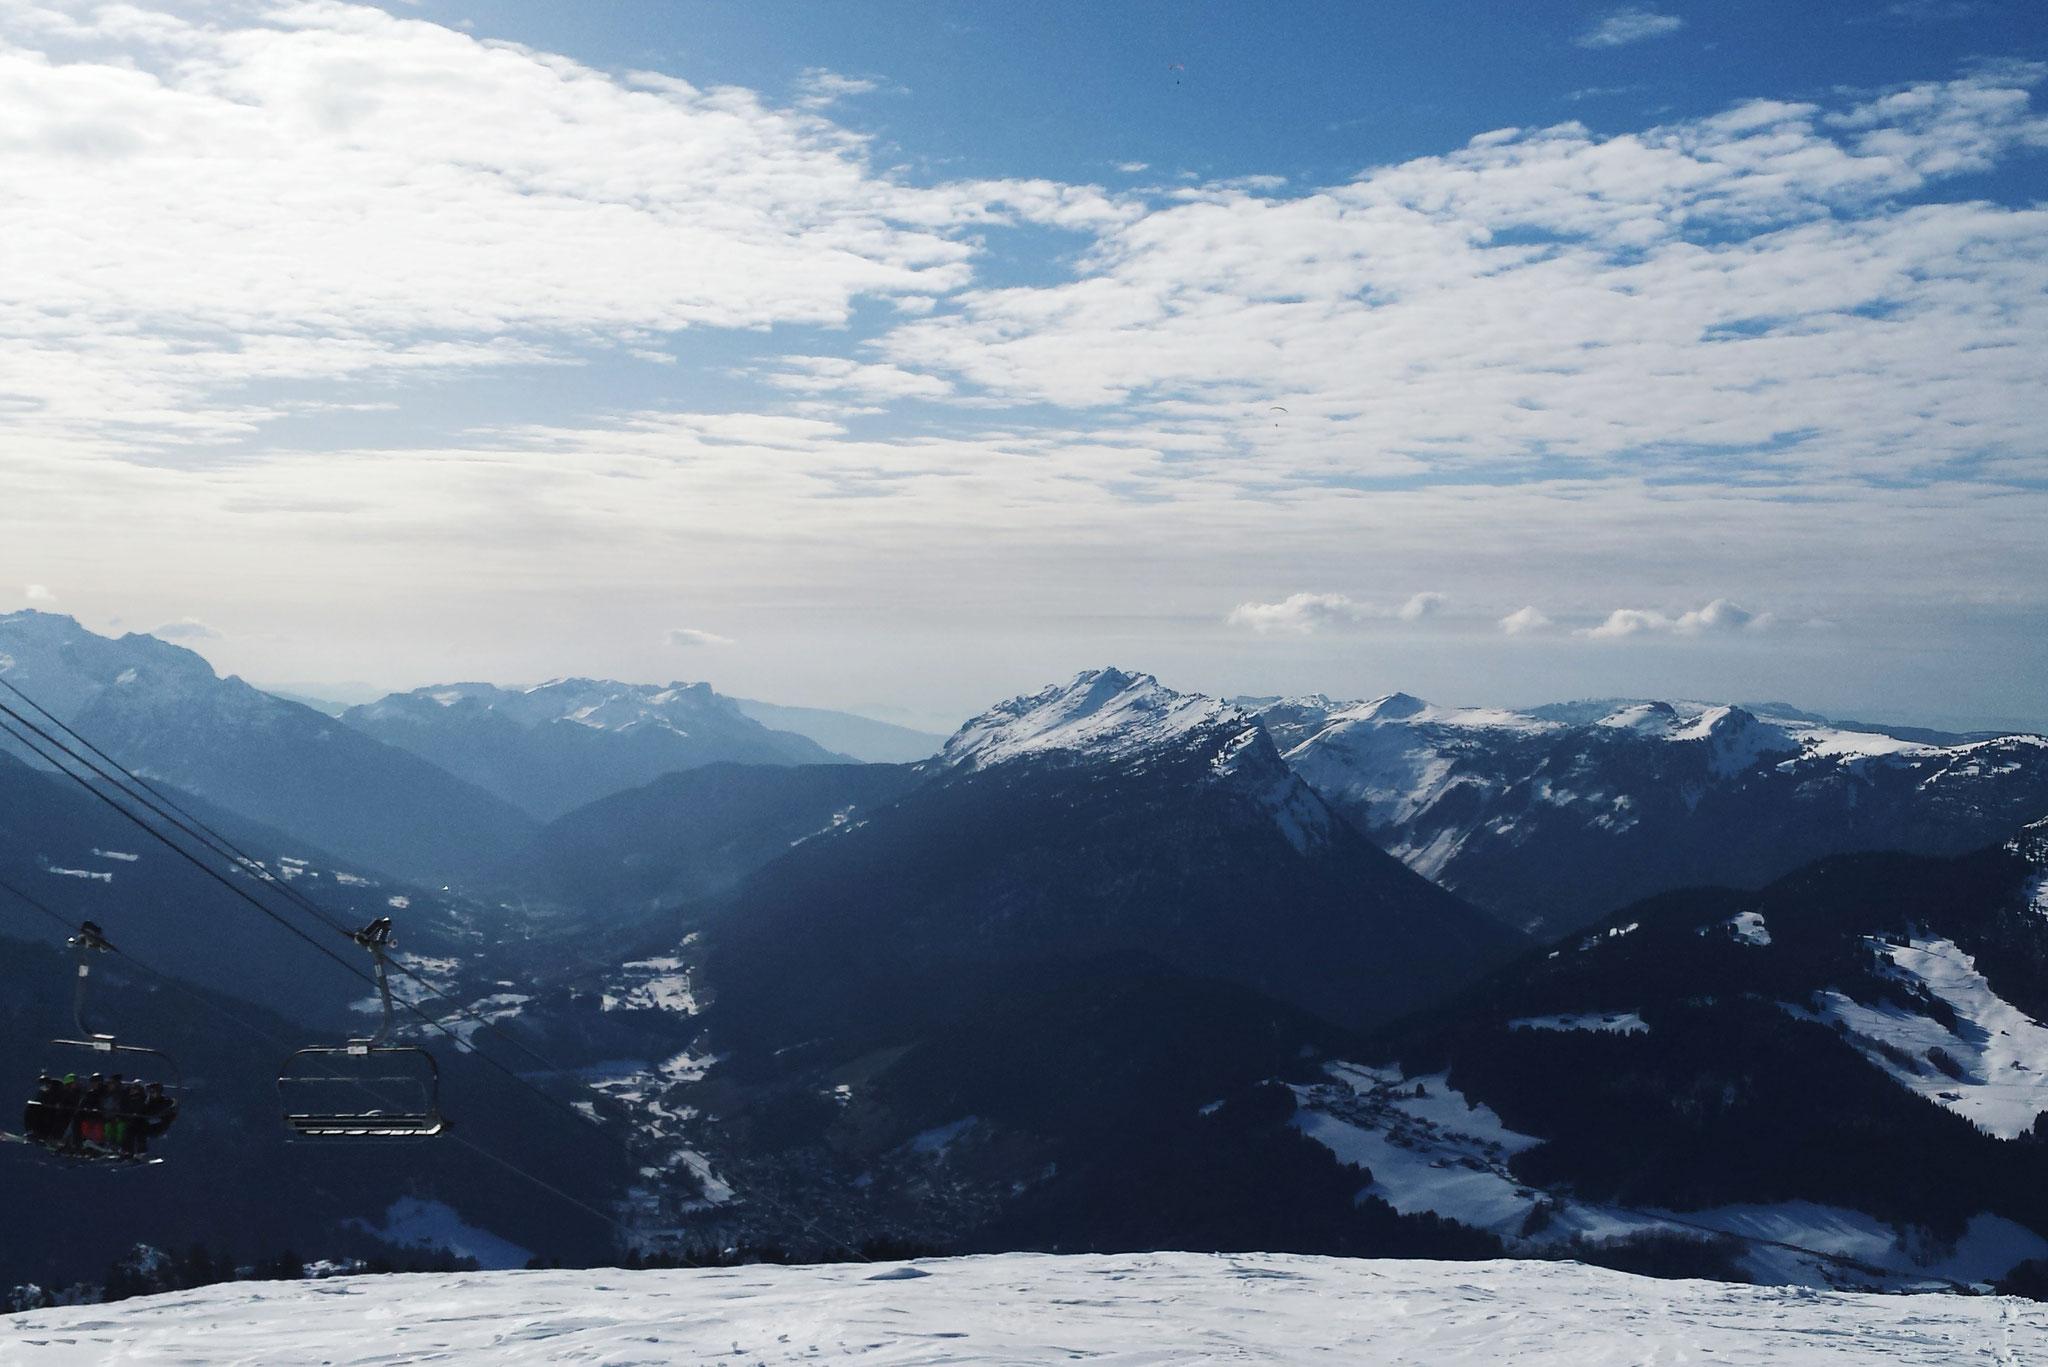 Travleblog, France Ski Mountains Alpes, Carmen Schubert